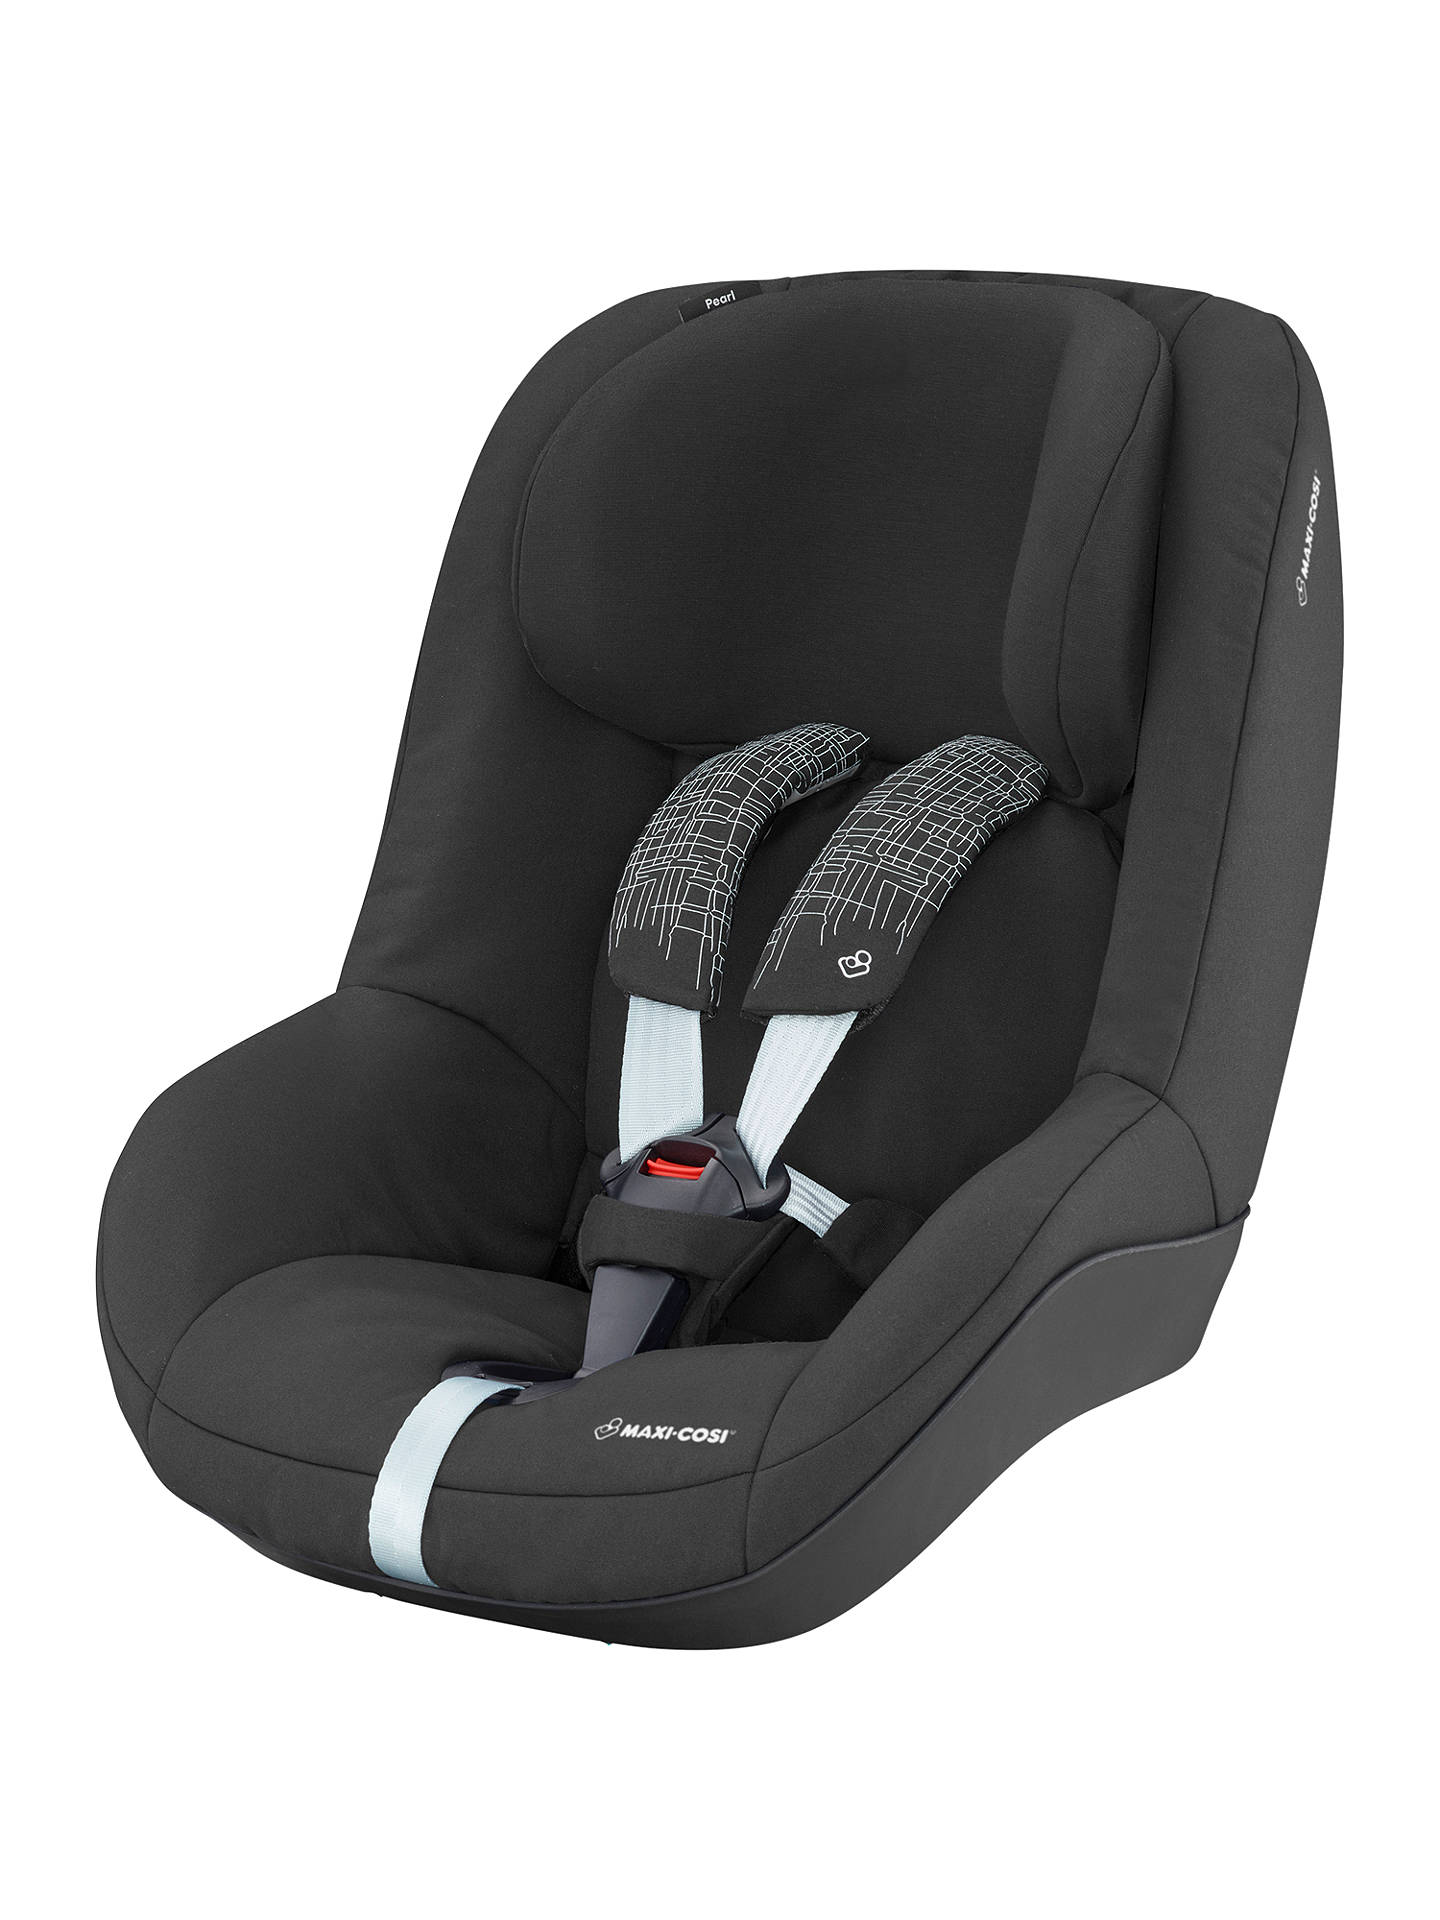 maxi cosi tobi car seat instructions manual viewkaka co